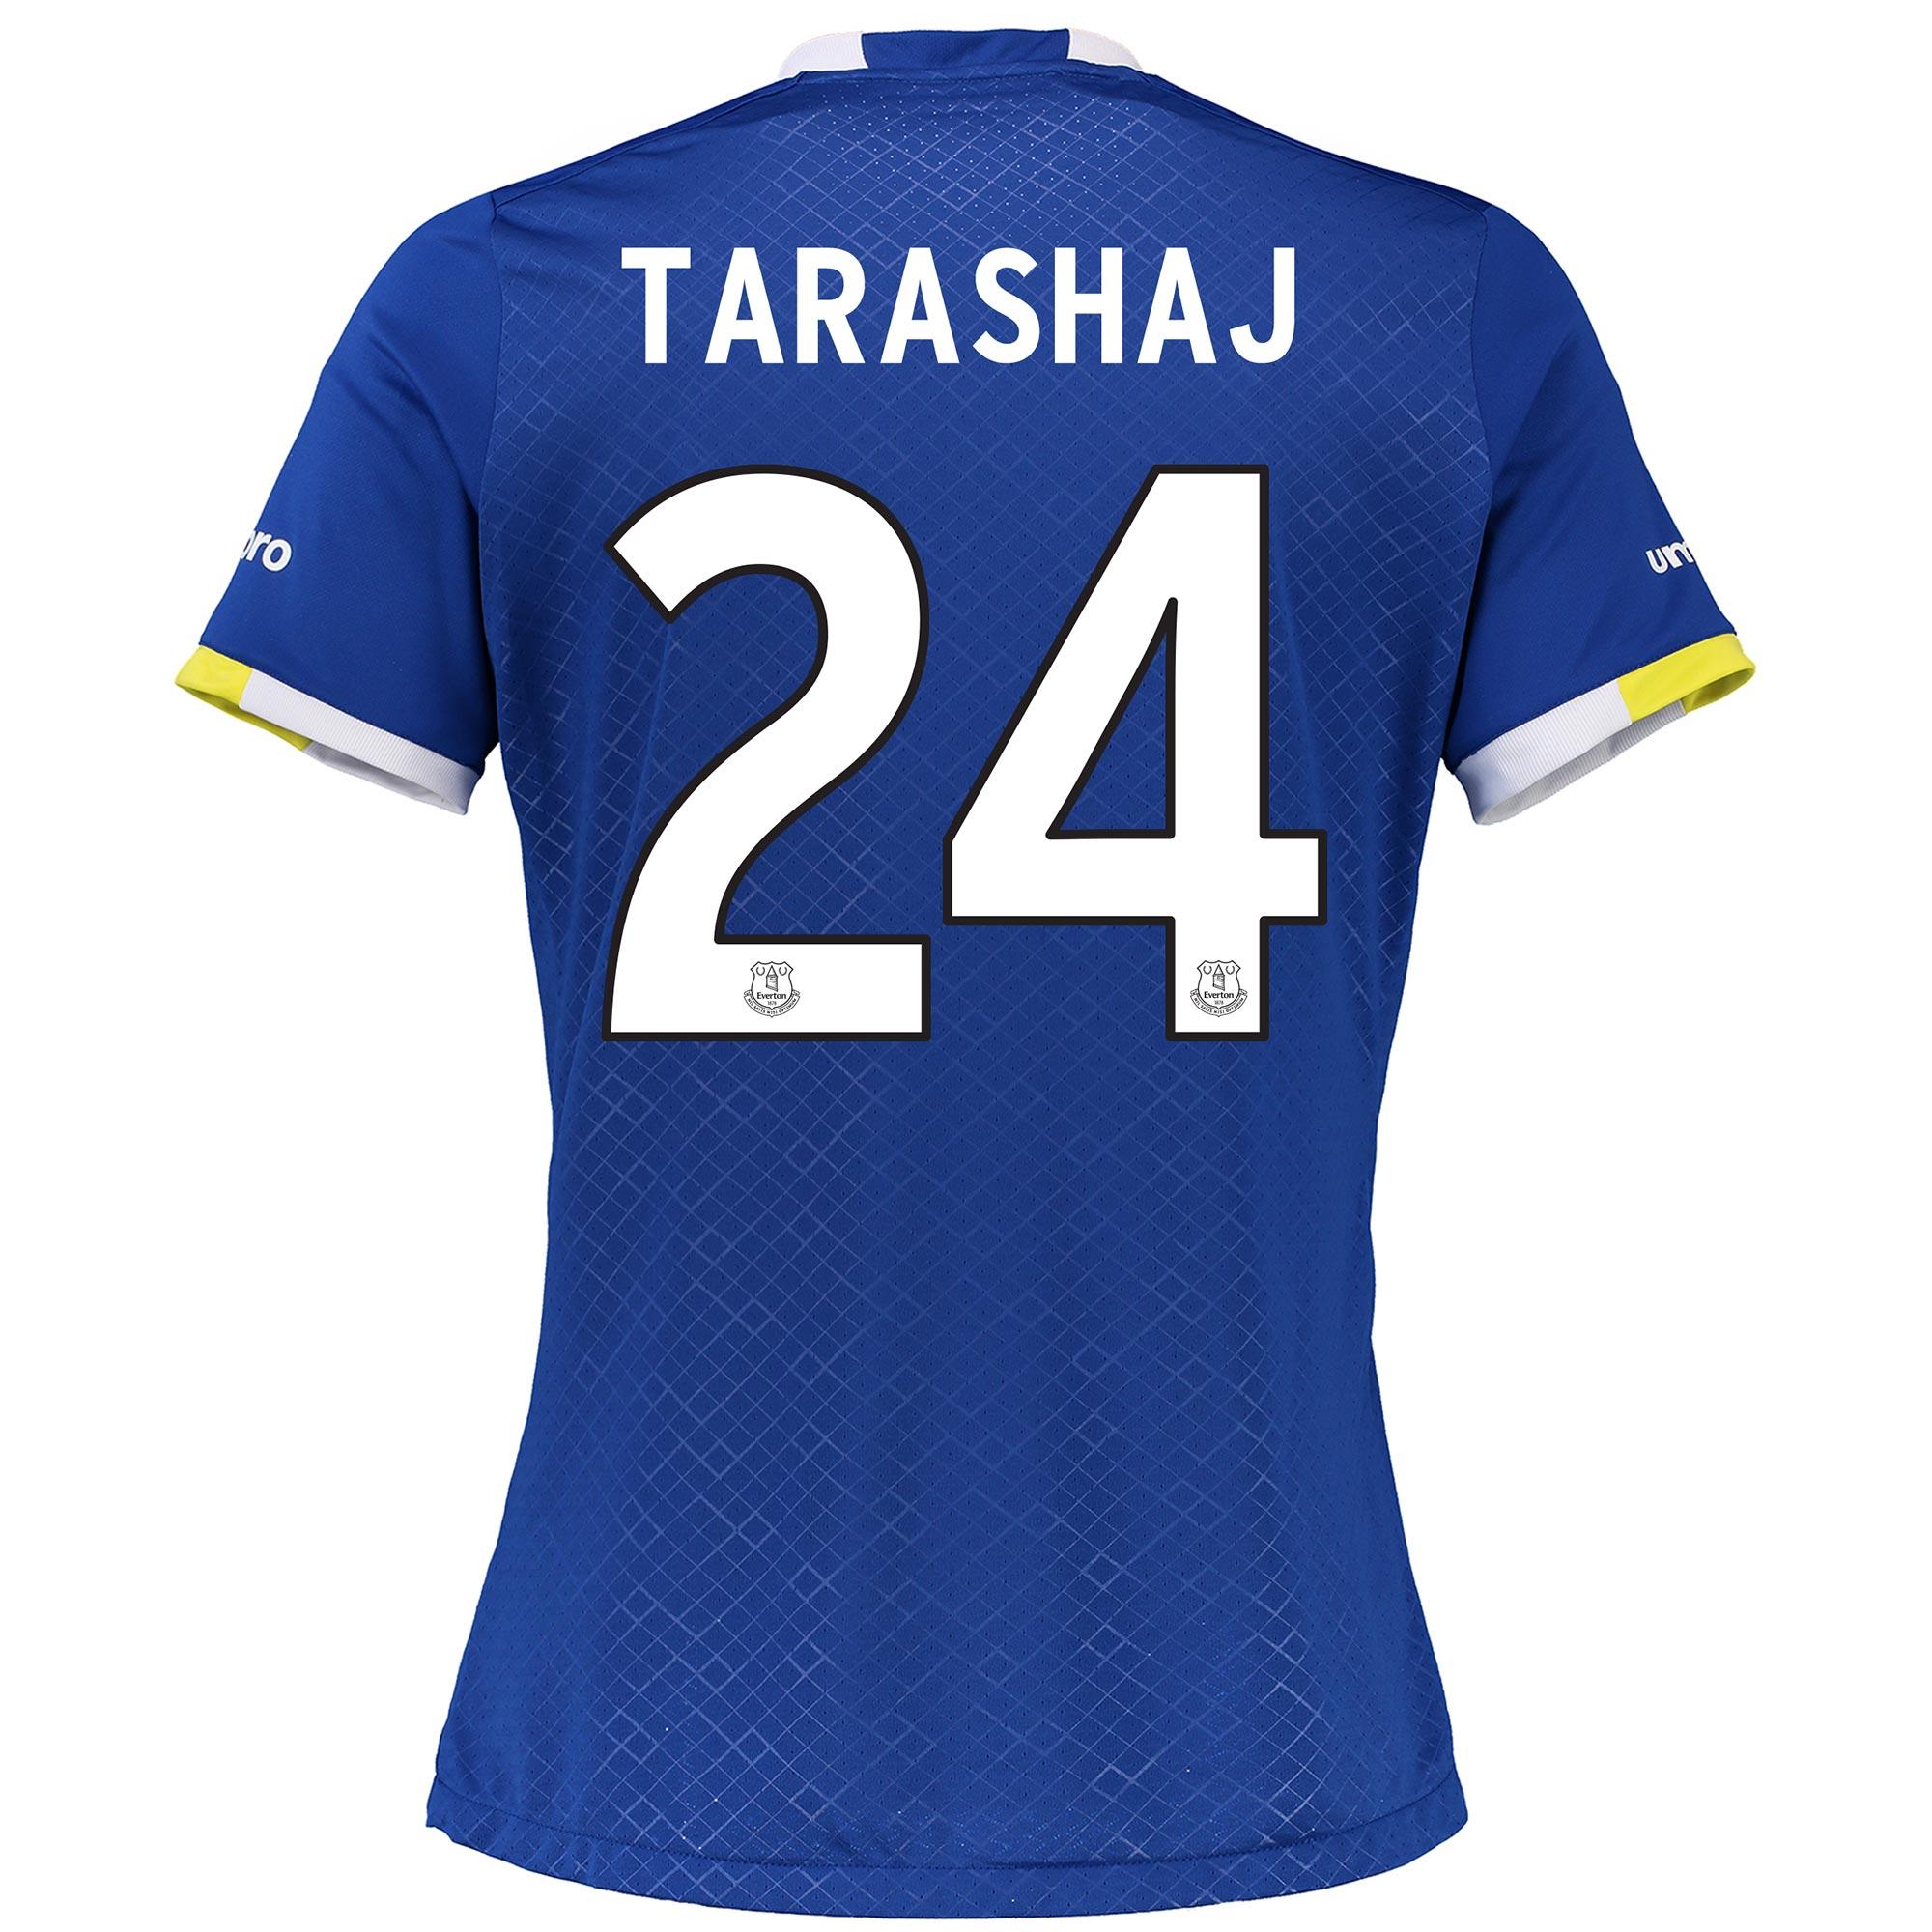 Everton Home Cup Shirt 2016/17 - Womens with Tarashaj 24 printing